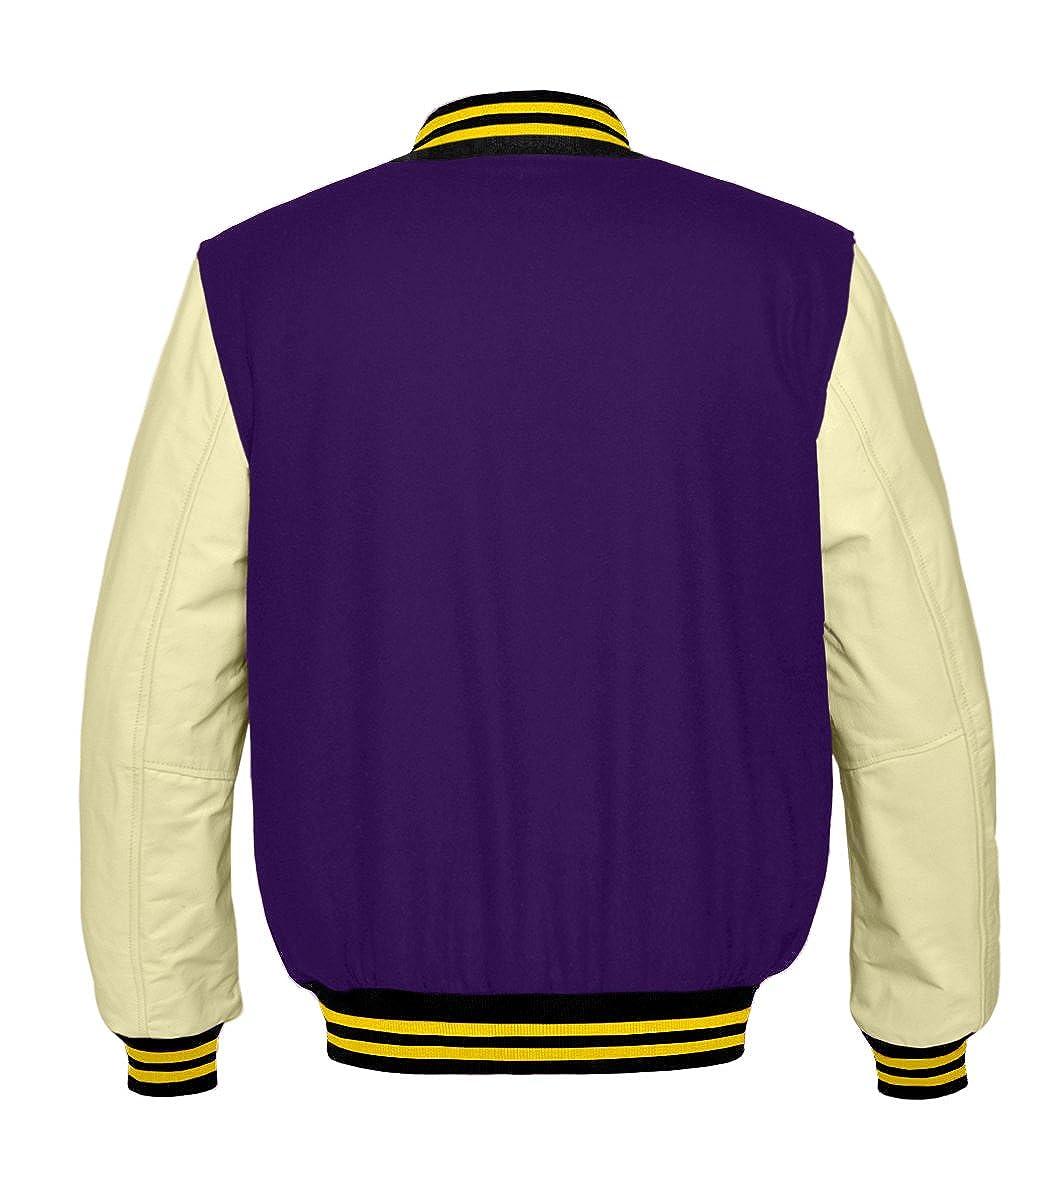 luvsecretlingerie Original American Varsity Real Cream Leather Letterman College Baseball Kid Wool Jackets #C-Y-C